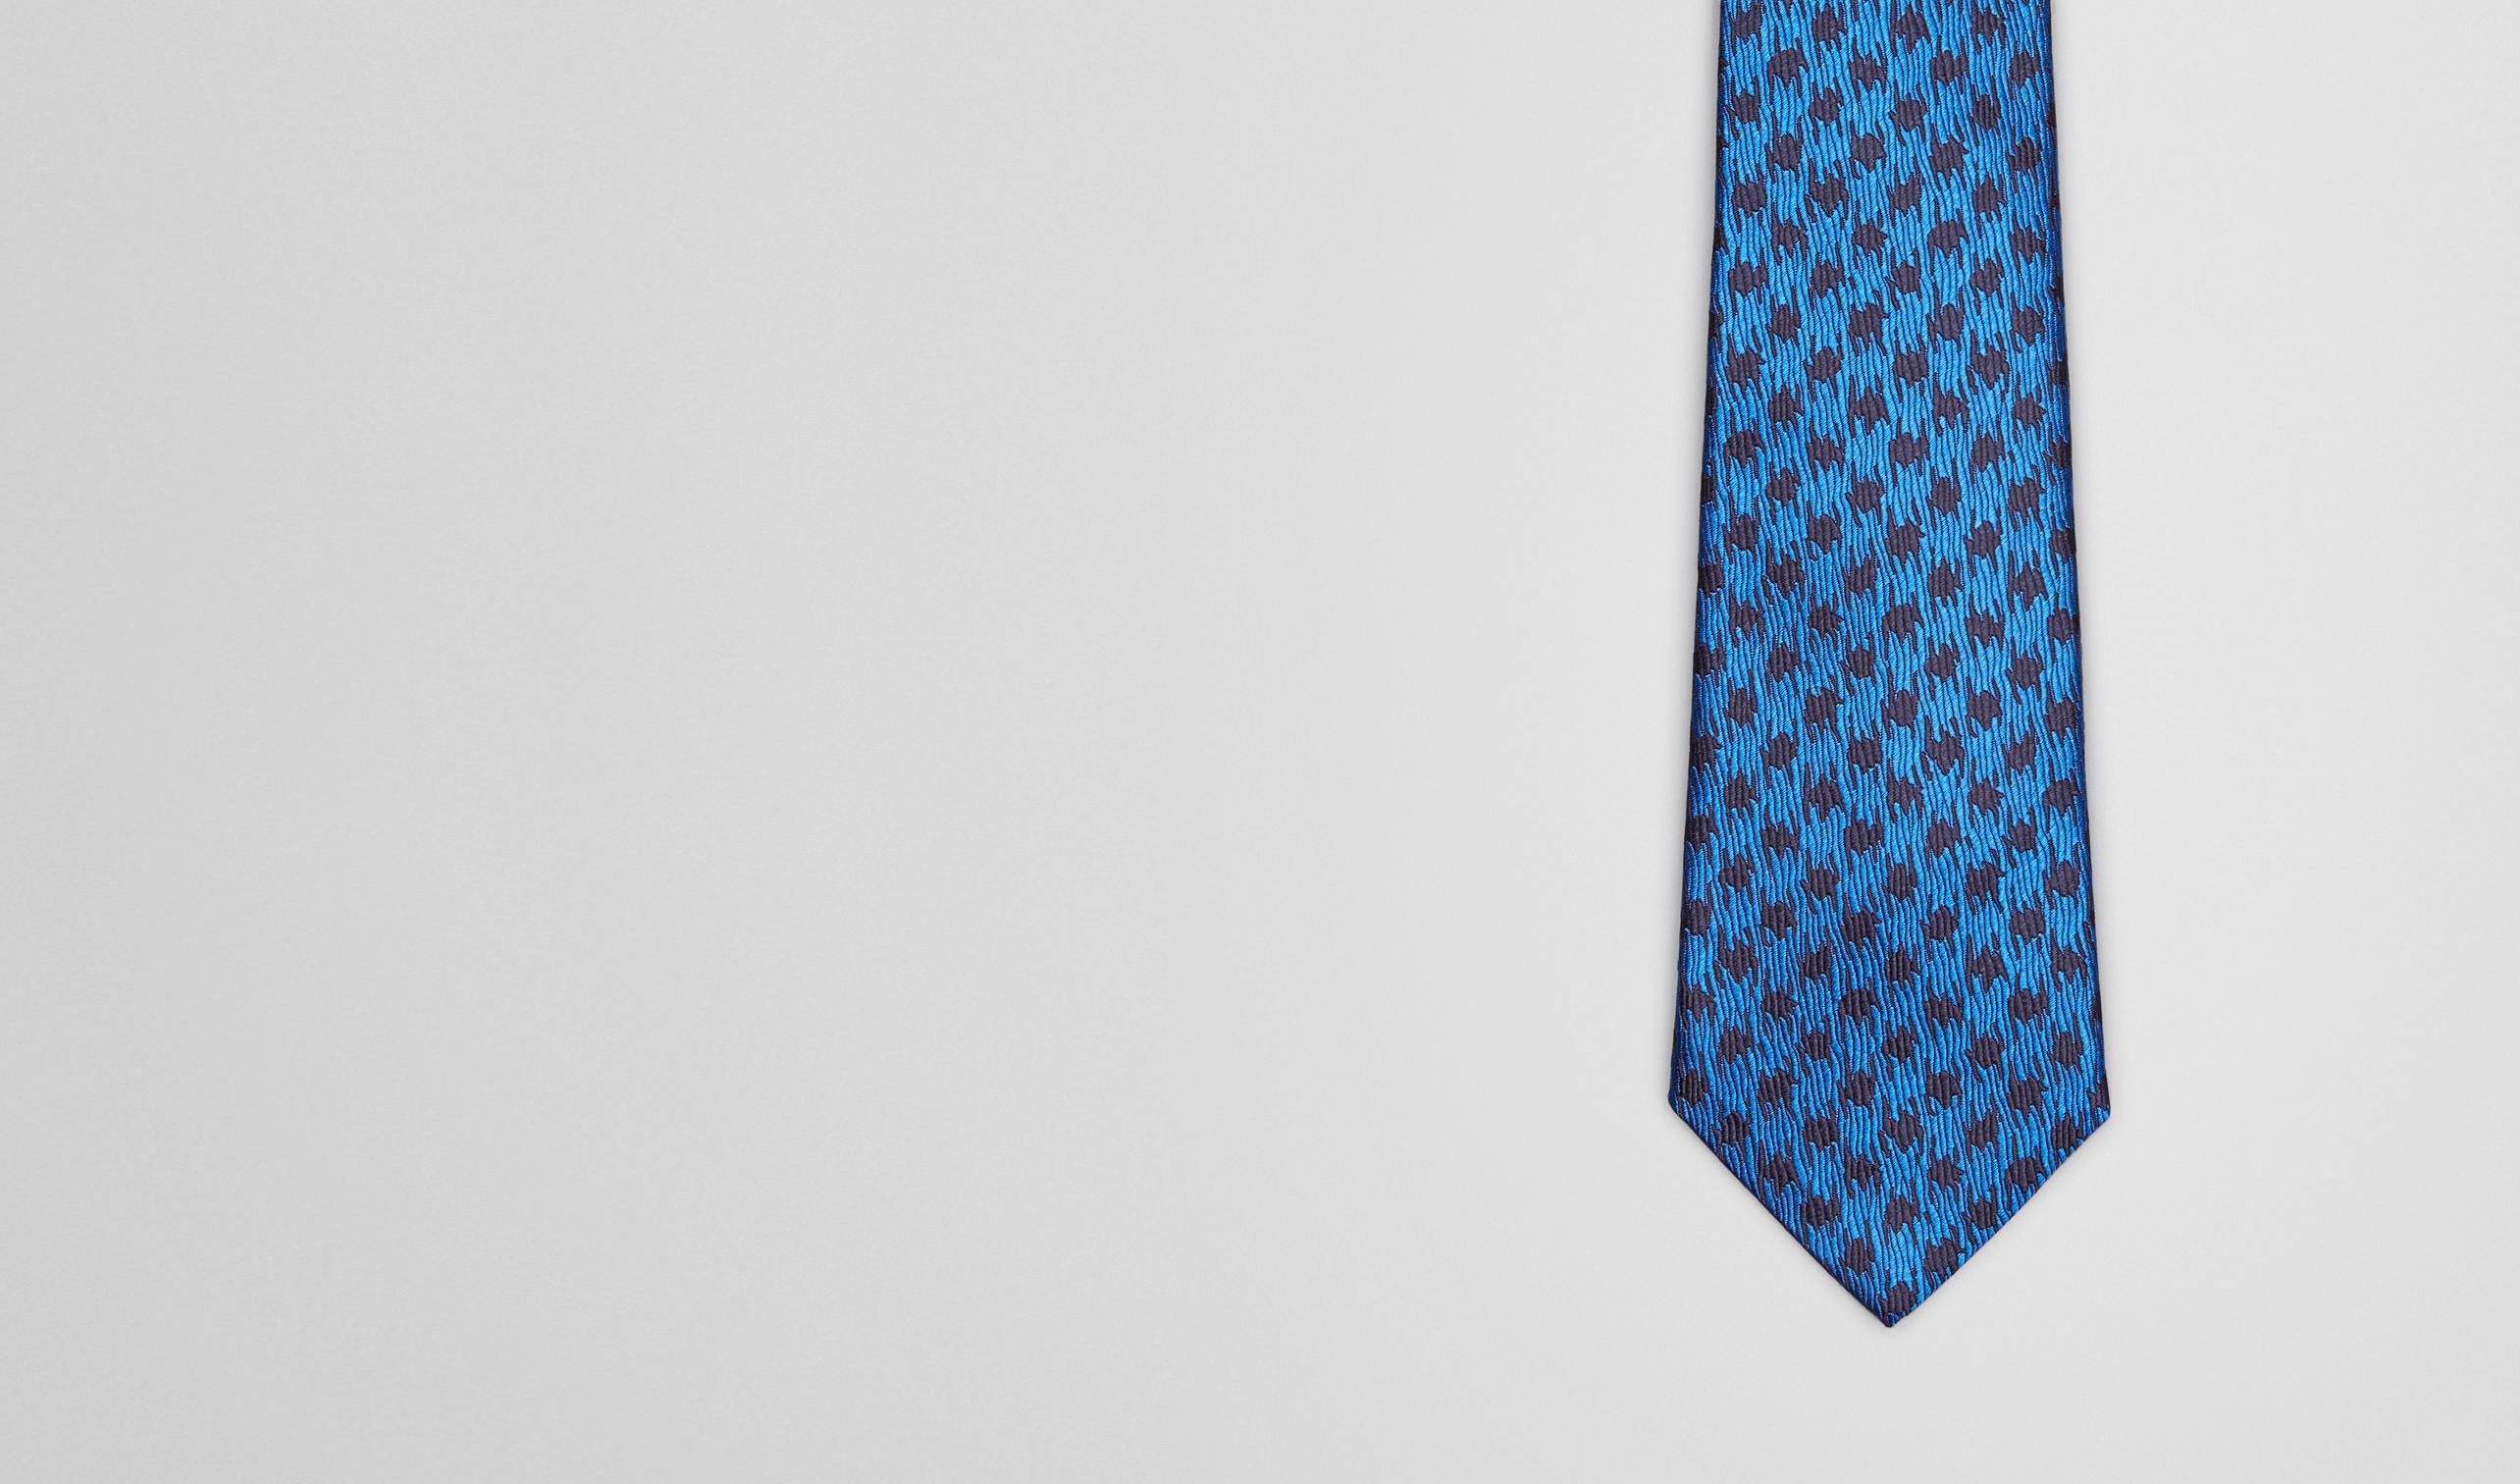 BOTTEGA VENETA Cravatte U CRAVATTA ROYAL BLUE IN SETA pl